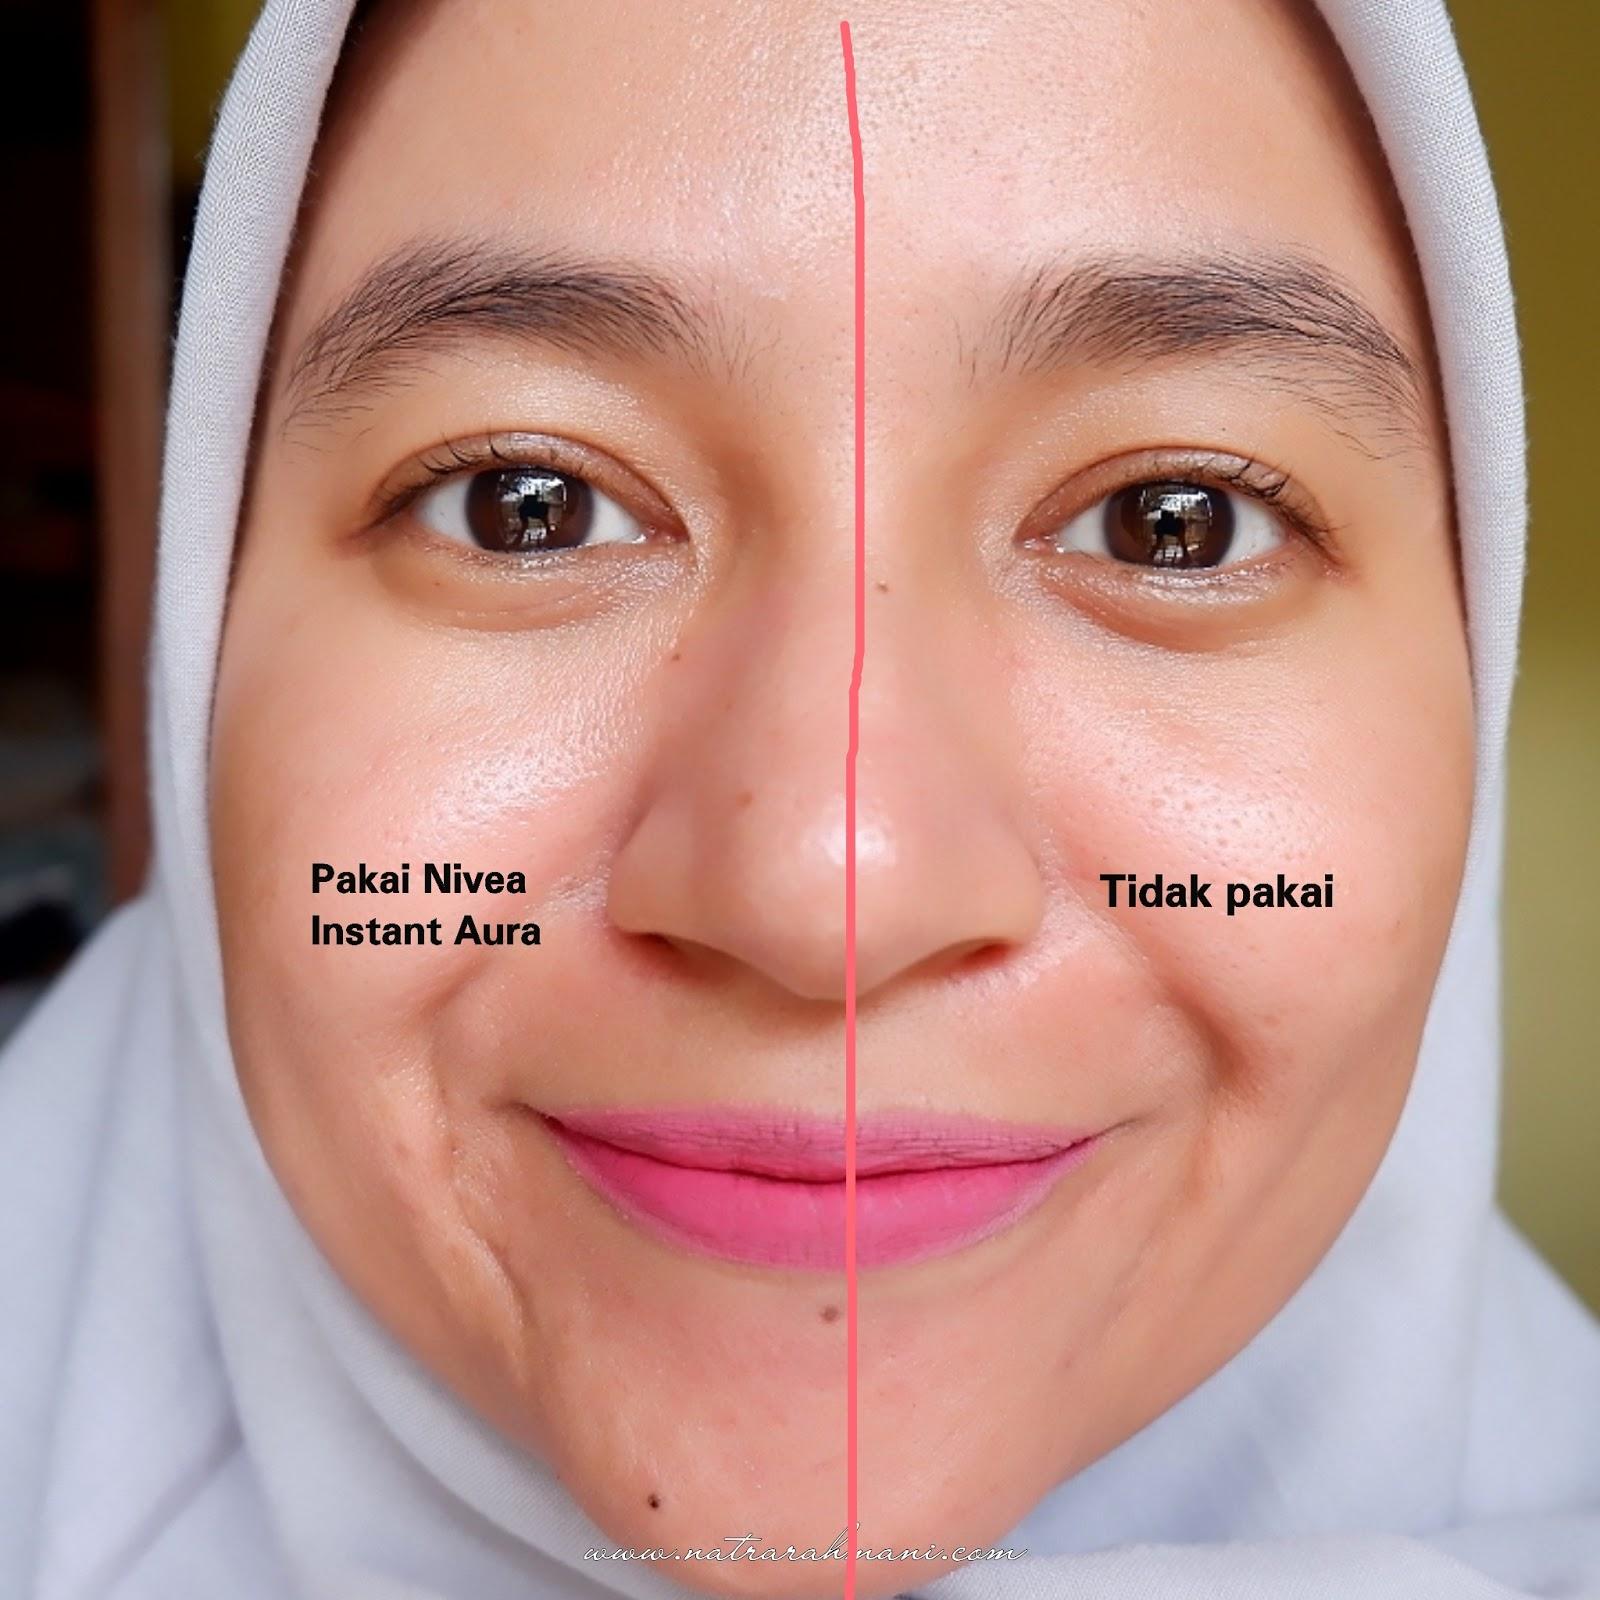 review-nivea-sun-protect-white-instant-aura-serum-natrarahmani